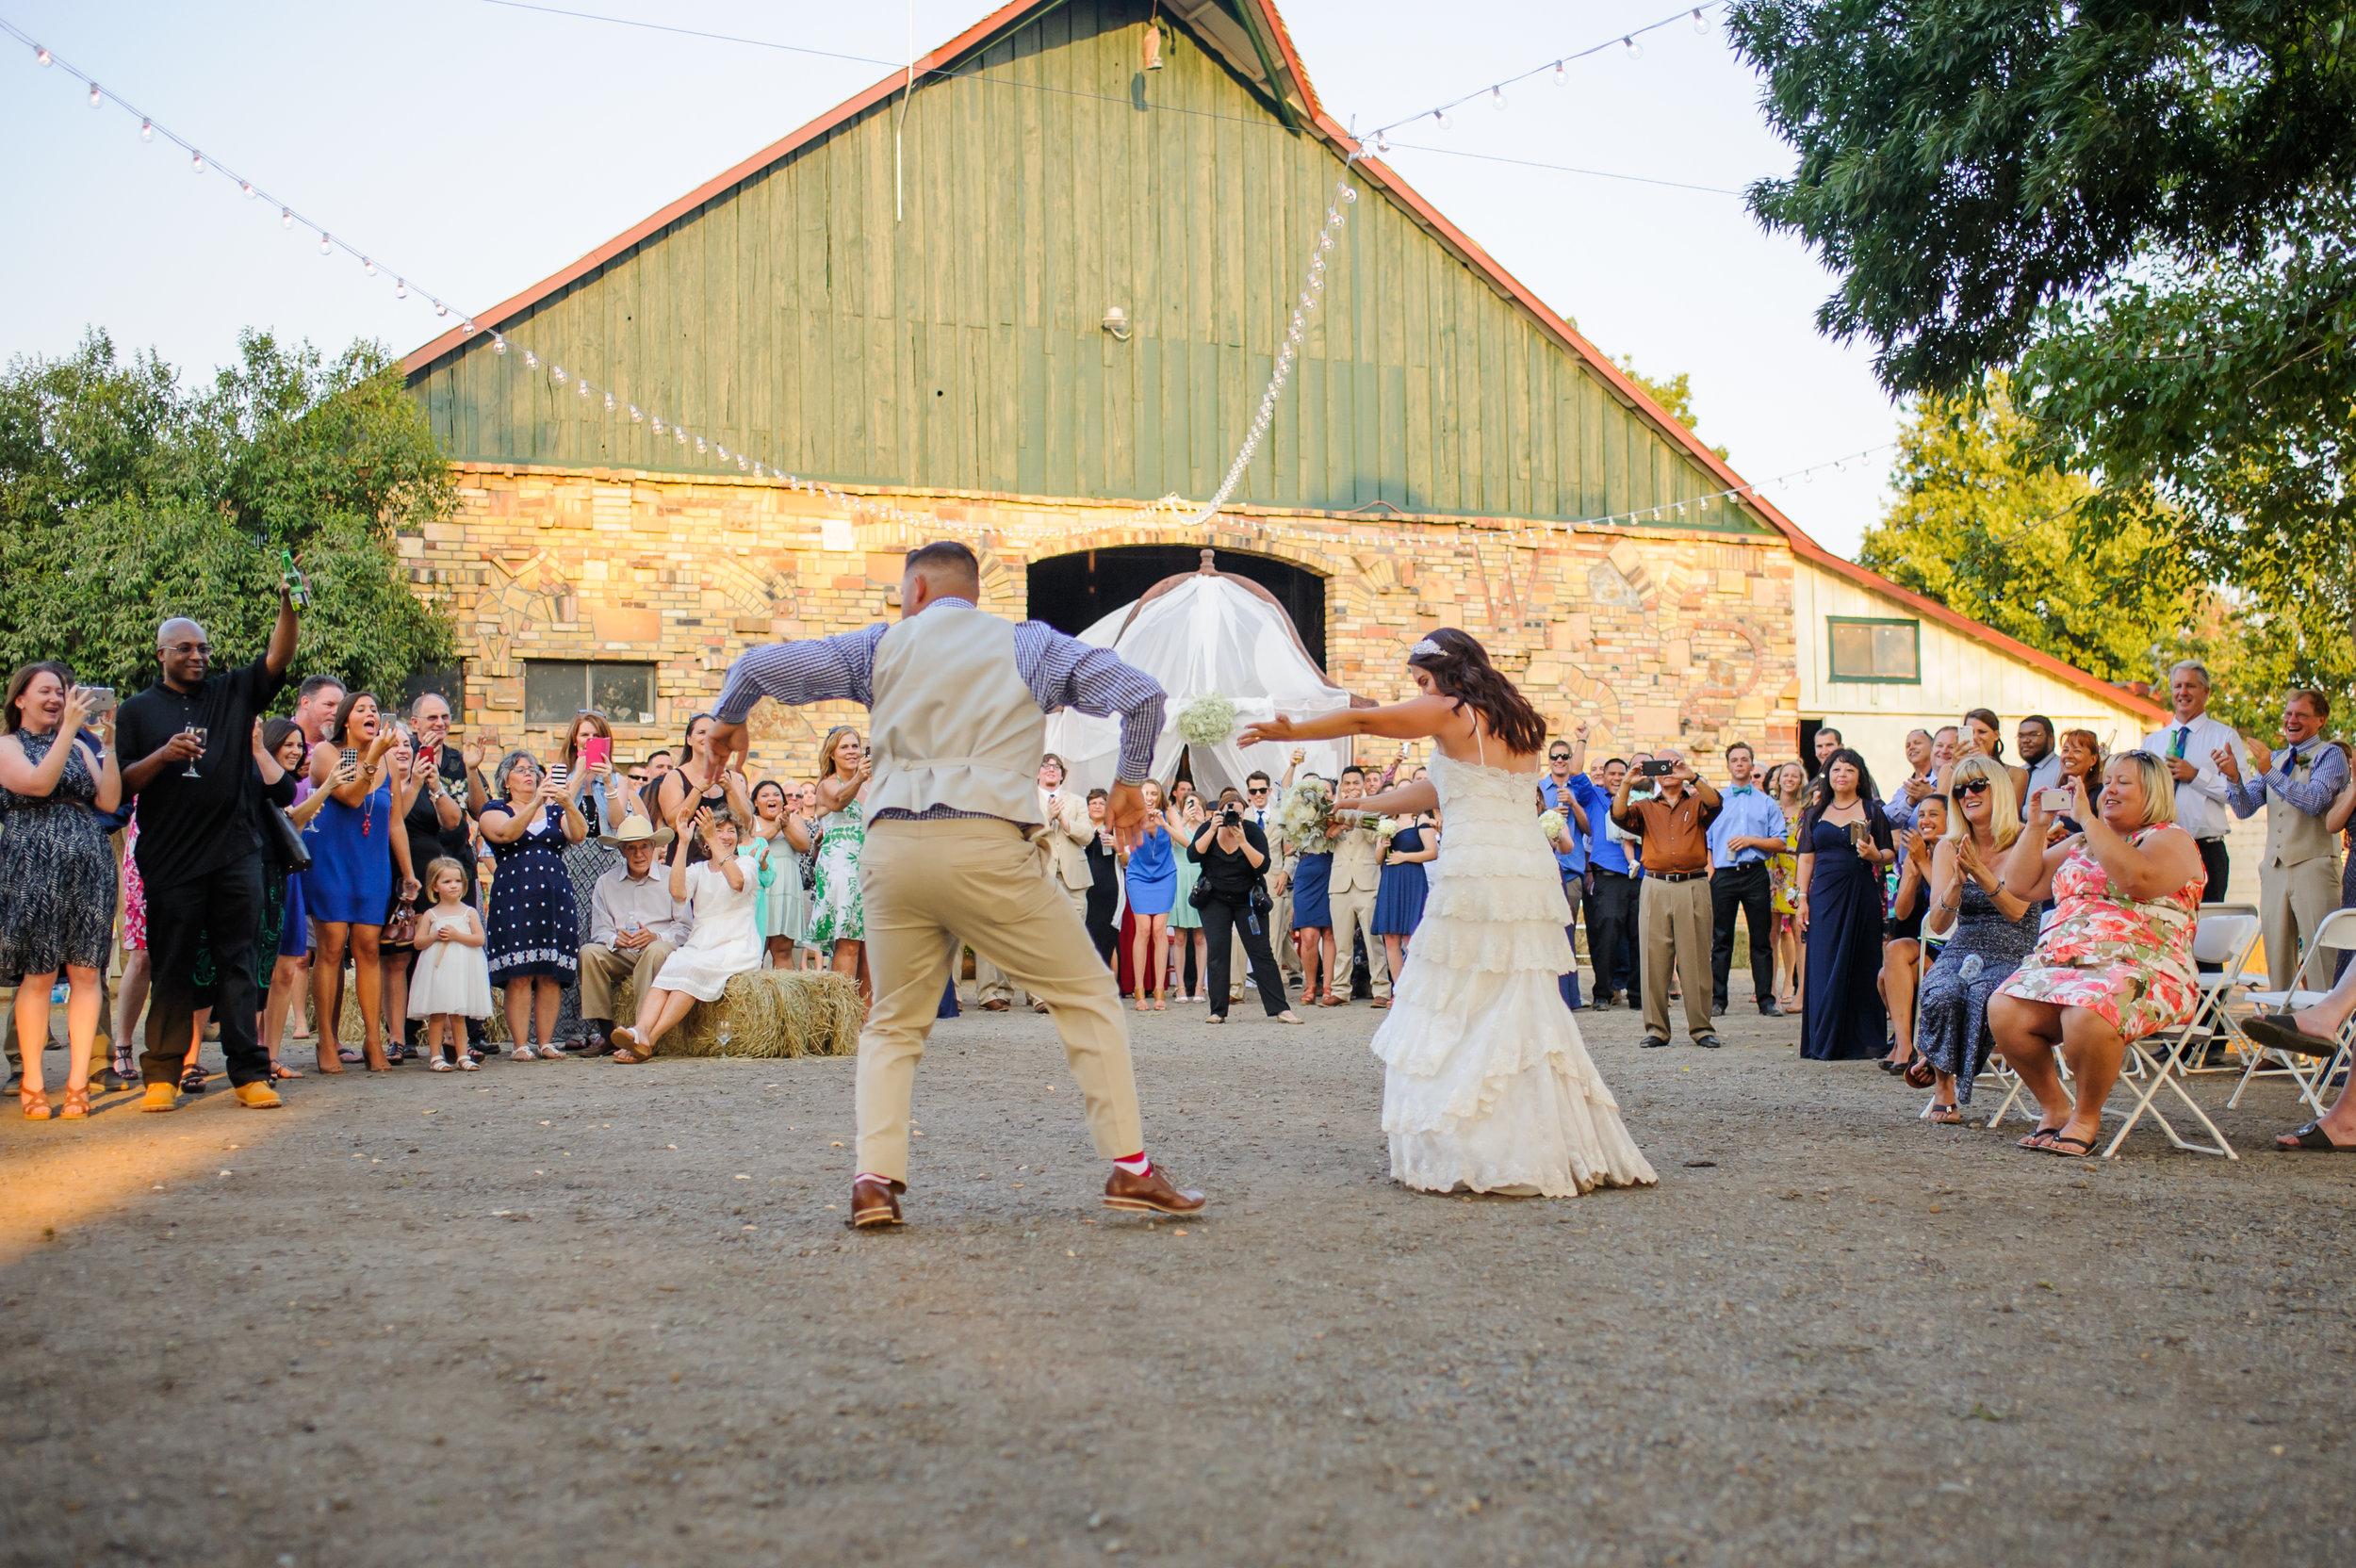 carly-geoff-029-horse-ranch-western-sacramento-wedding-photographer-katherine-nicole-photography.JPG